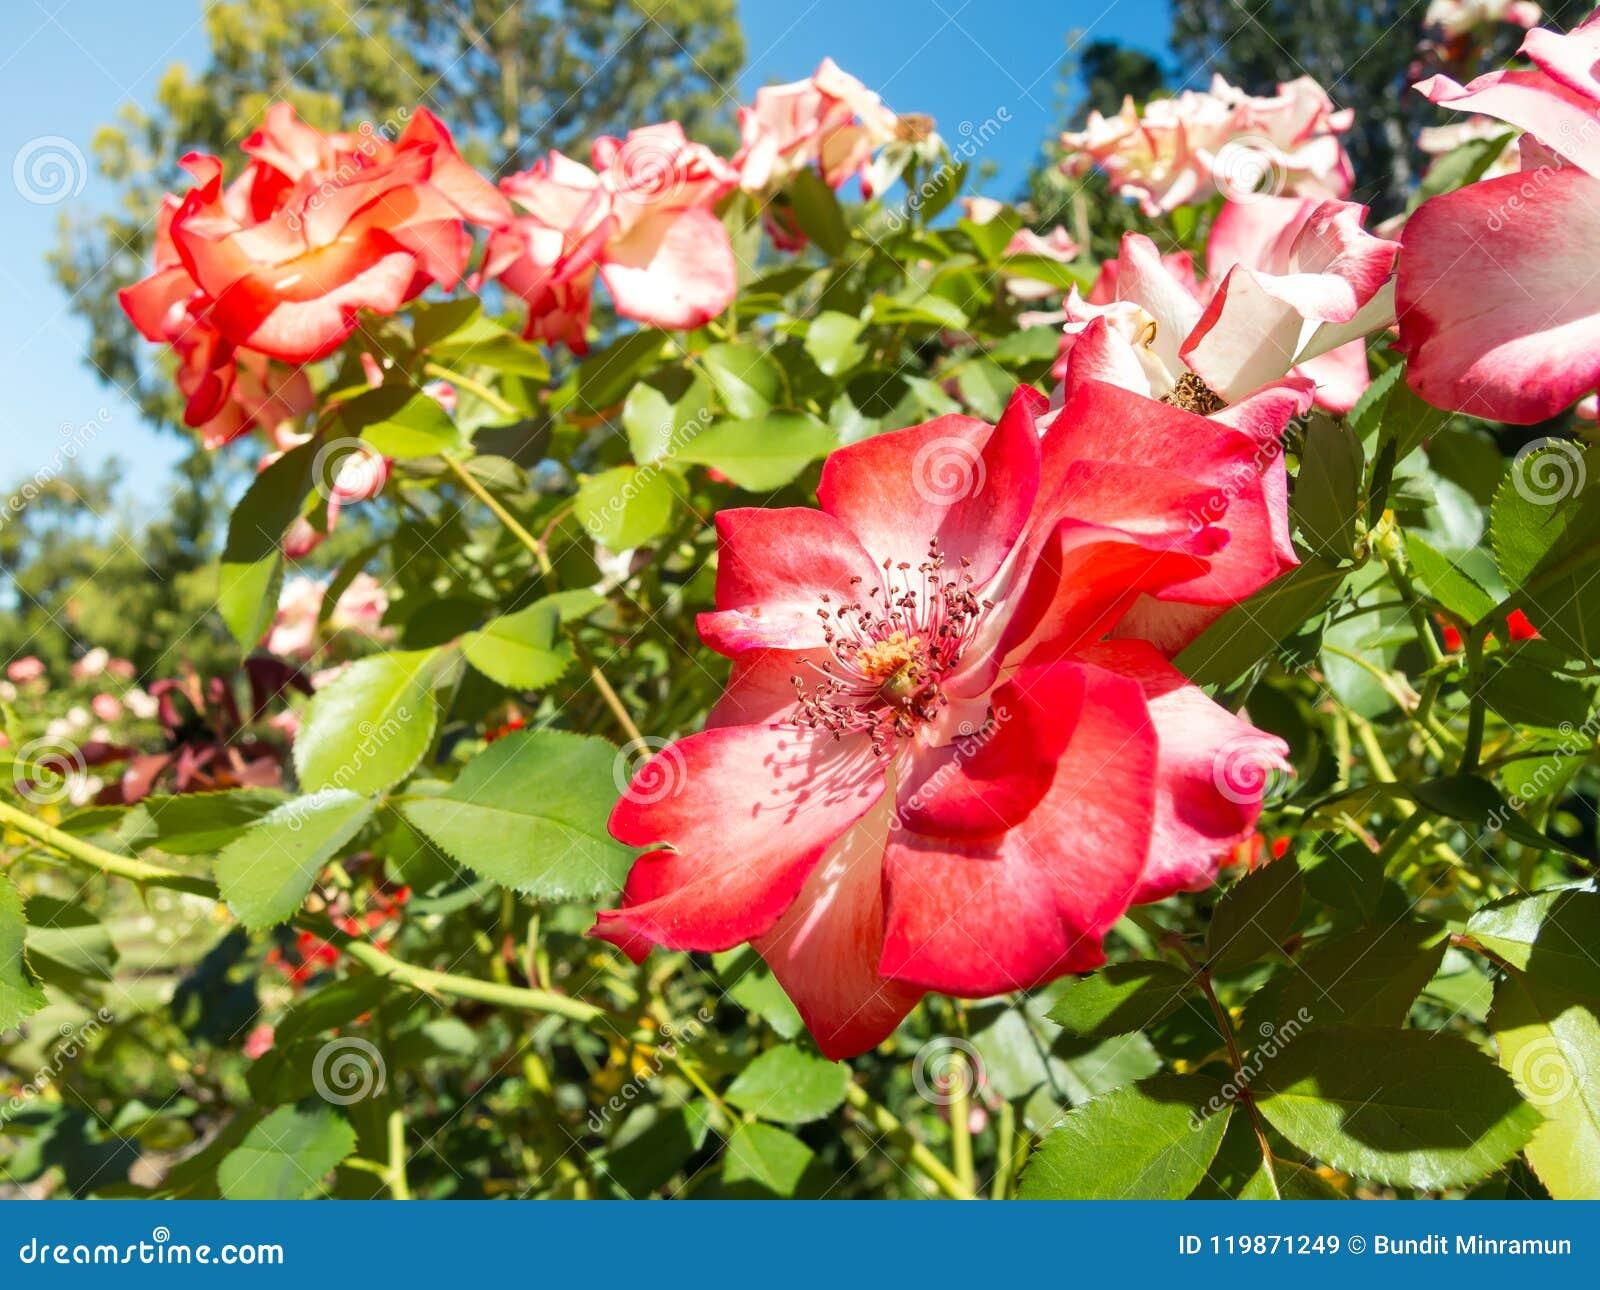 Lovely Red Pink Petal Of Rose Flower In Spring Season At A Botanical